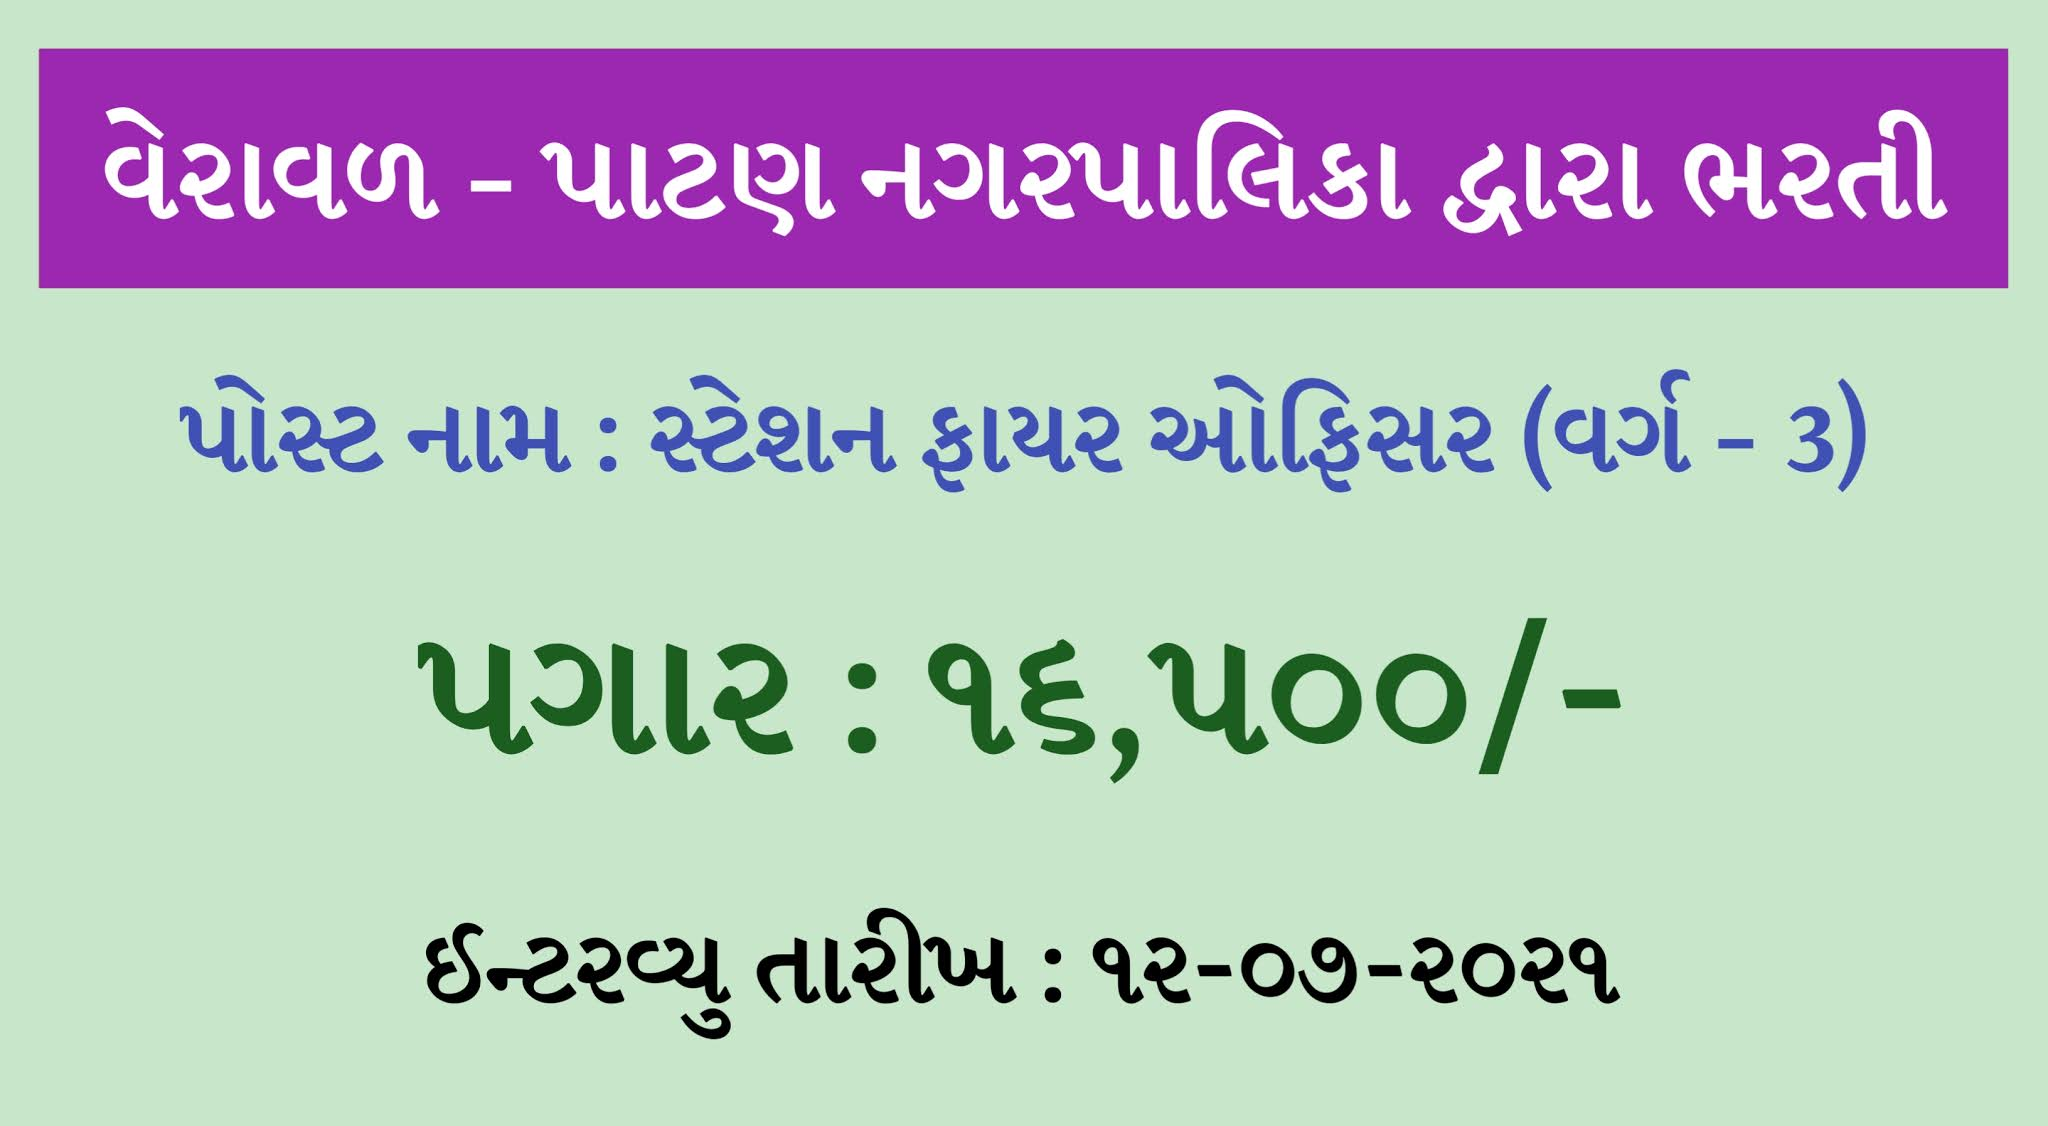 Veraval - Patan Nagarpalika Recruitment Fire Officer post 2021,Veraval - Patan Nagarpalika Recruitment 2021,Nagarpalika Recruitment 2021